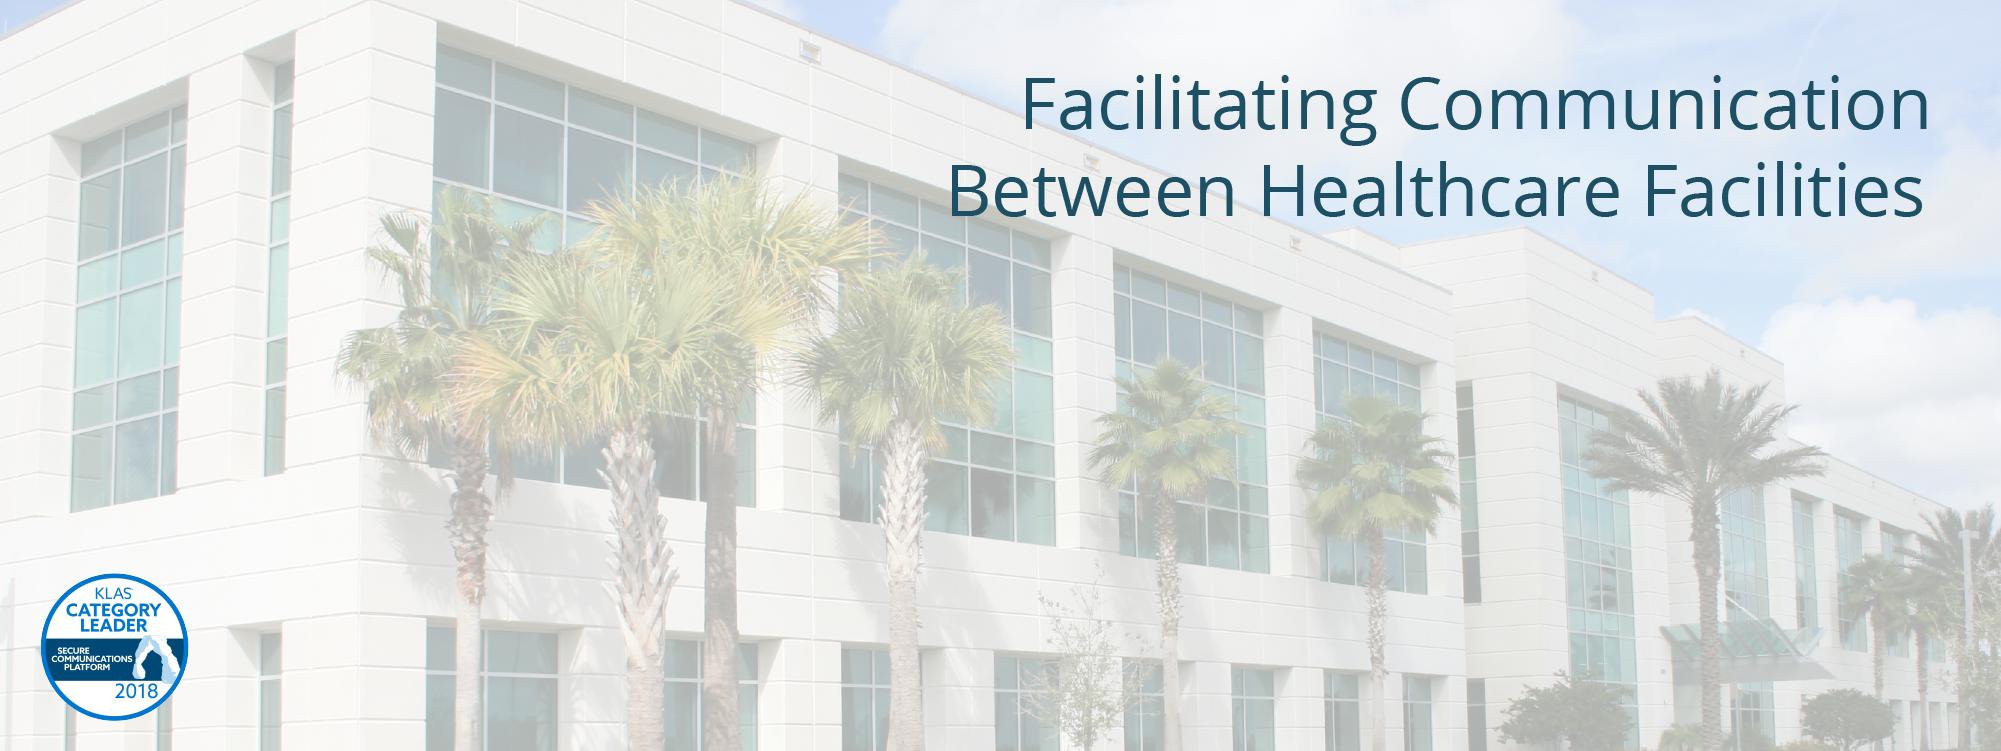 Facilitating Provider Communication Between Healthcare Facilities